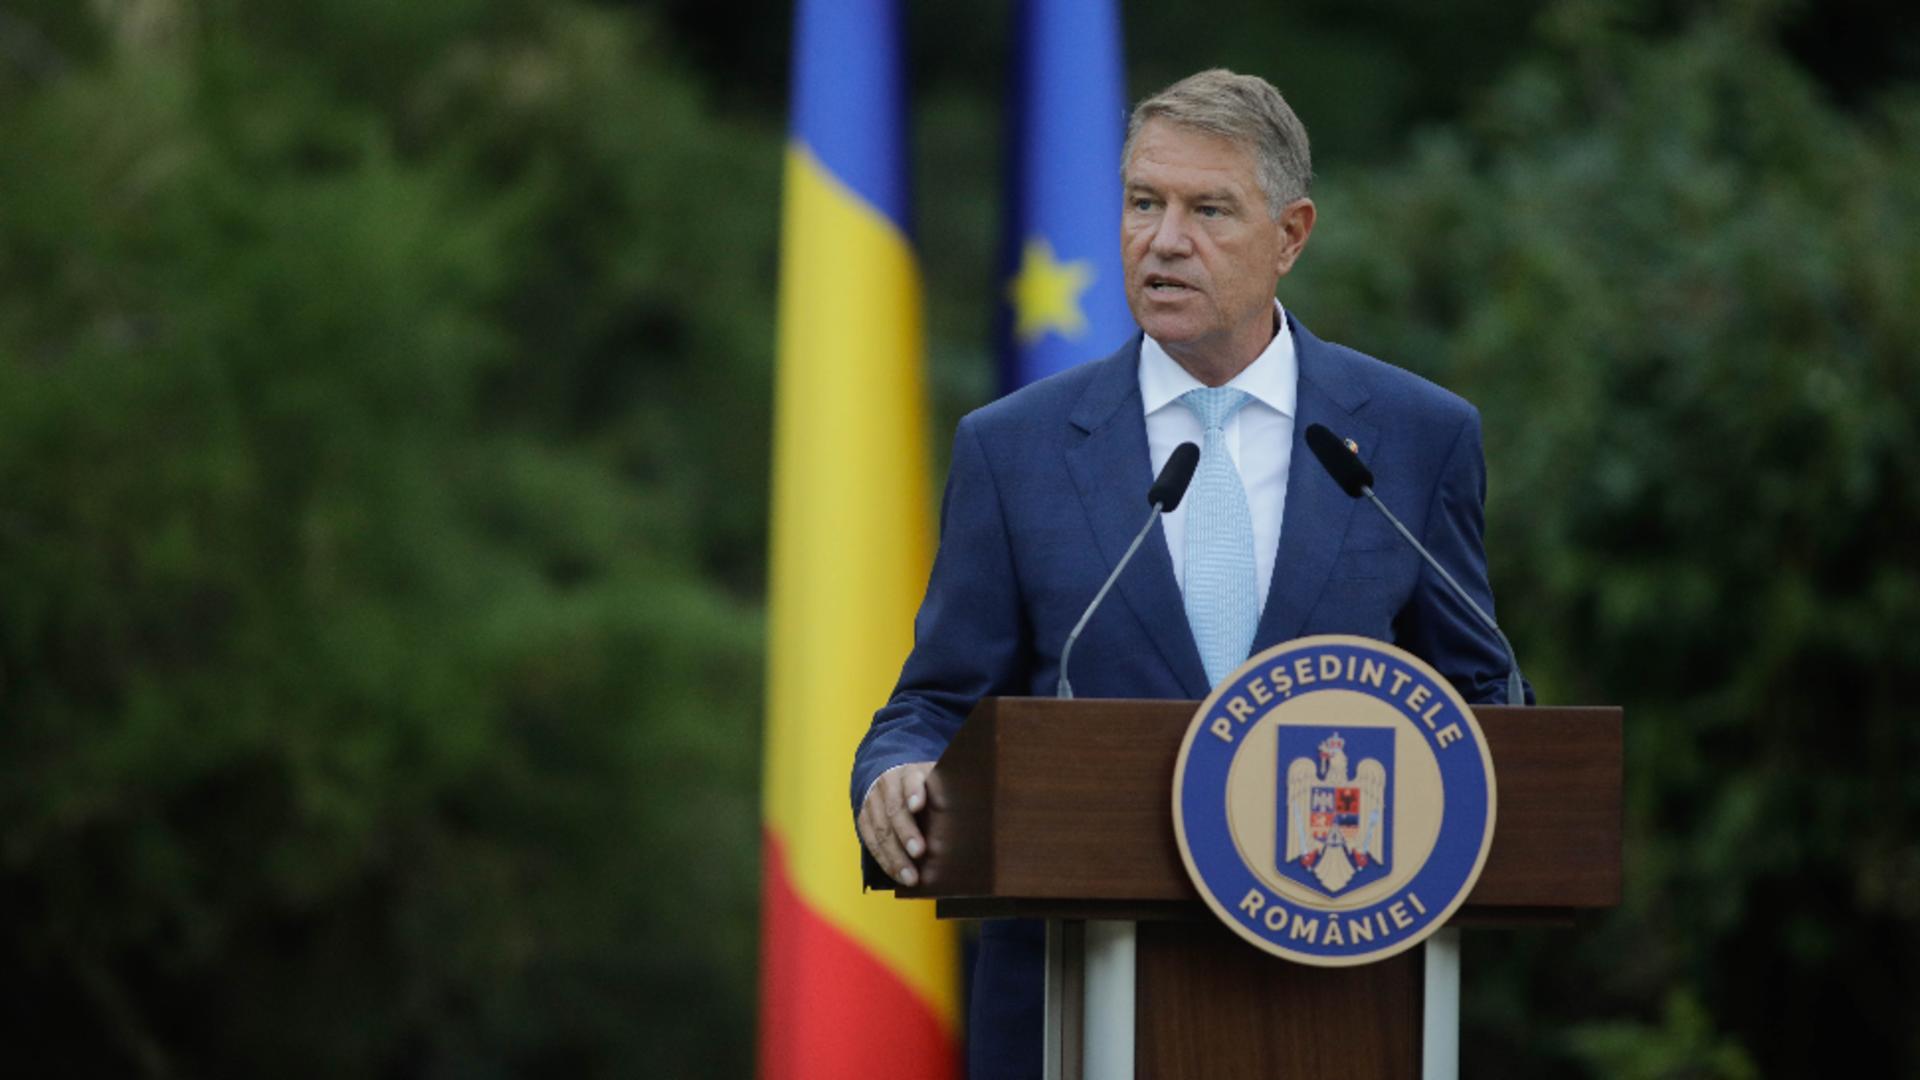 Președintele Klaus Iohannis. Foto: Inquam  / George Călin